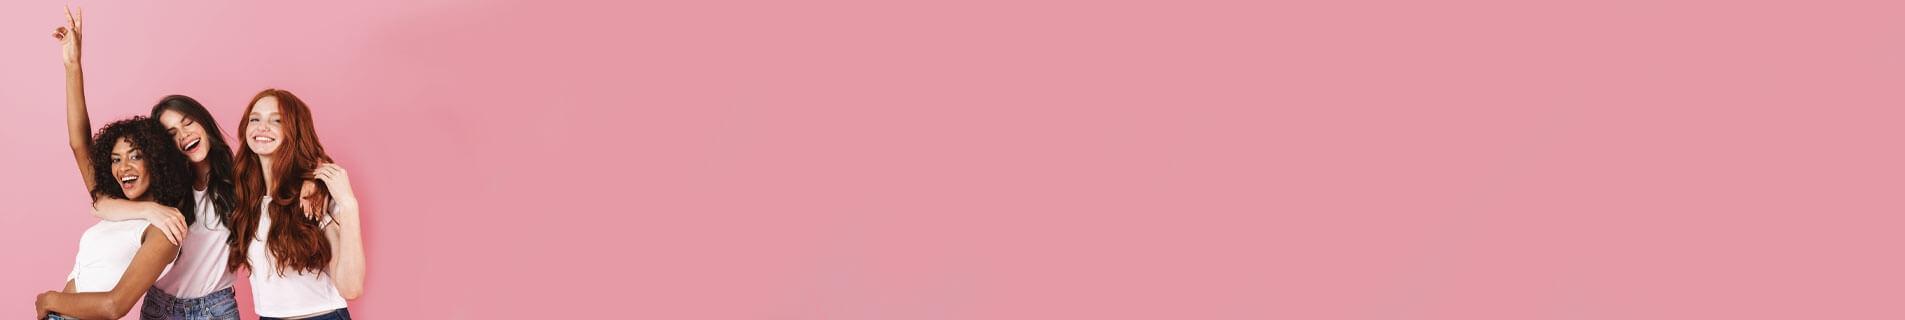 Ventes privées maquillage lèvres | Maquillage pas cher | SAGA Cosmetics